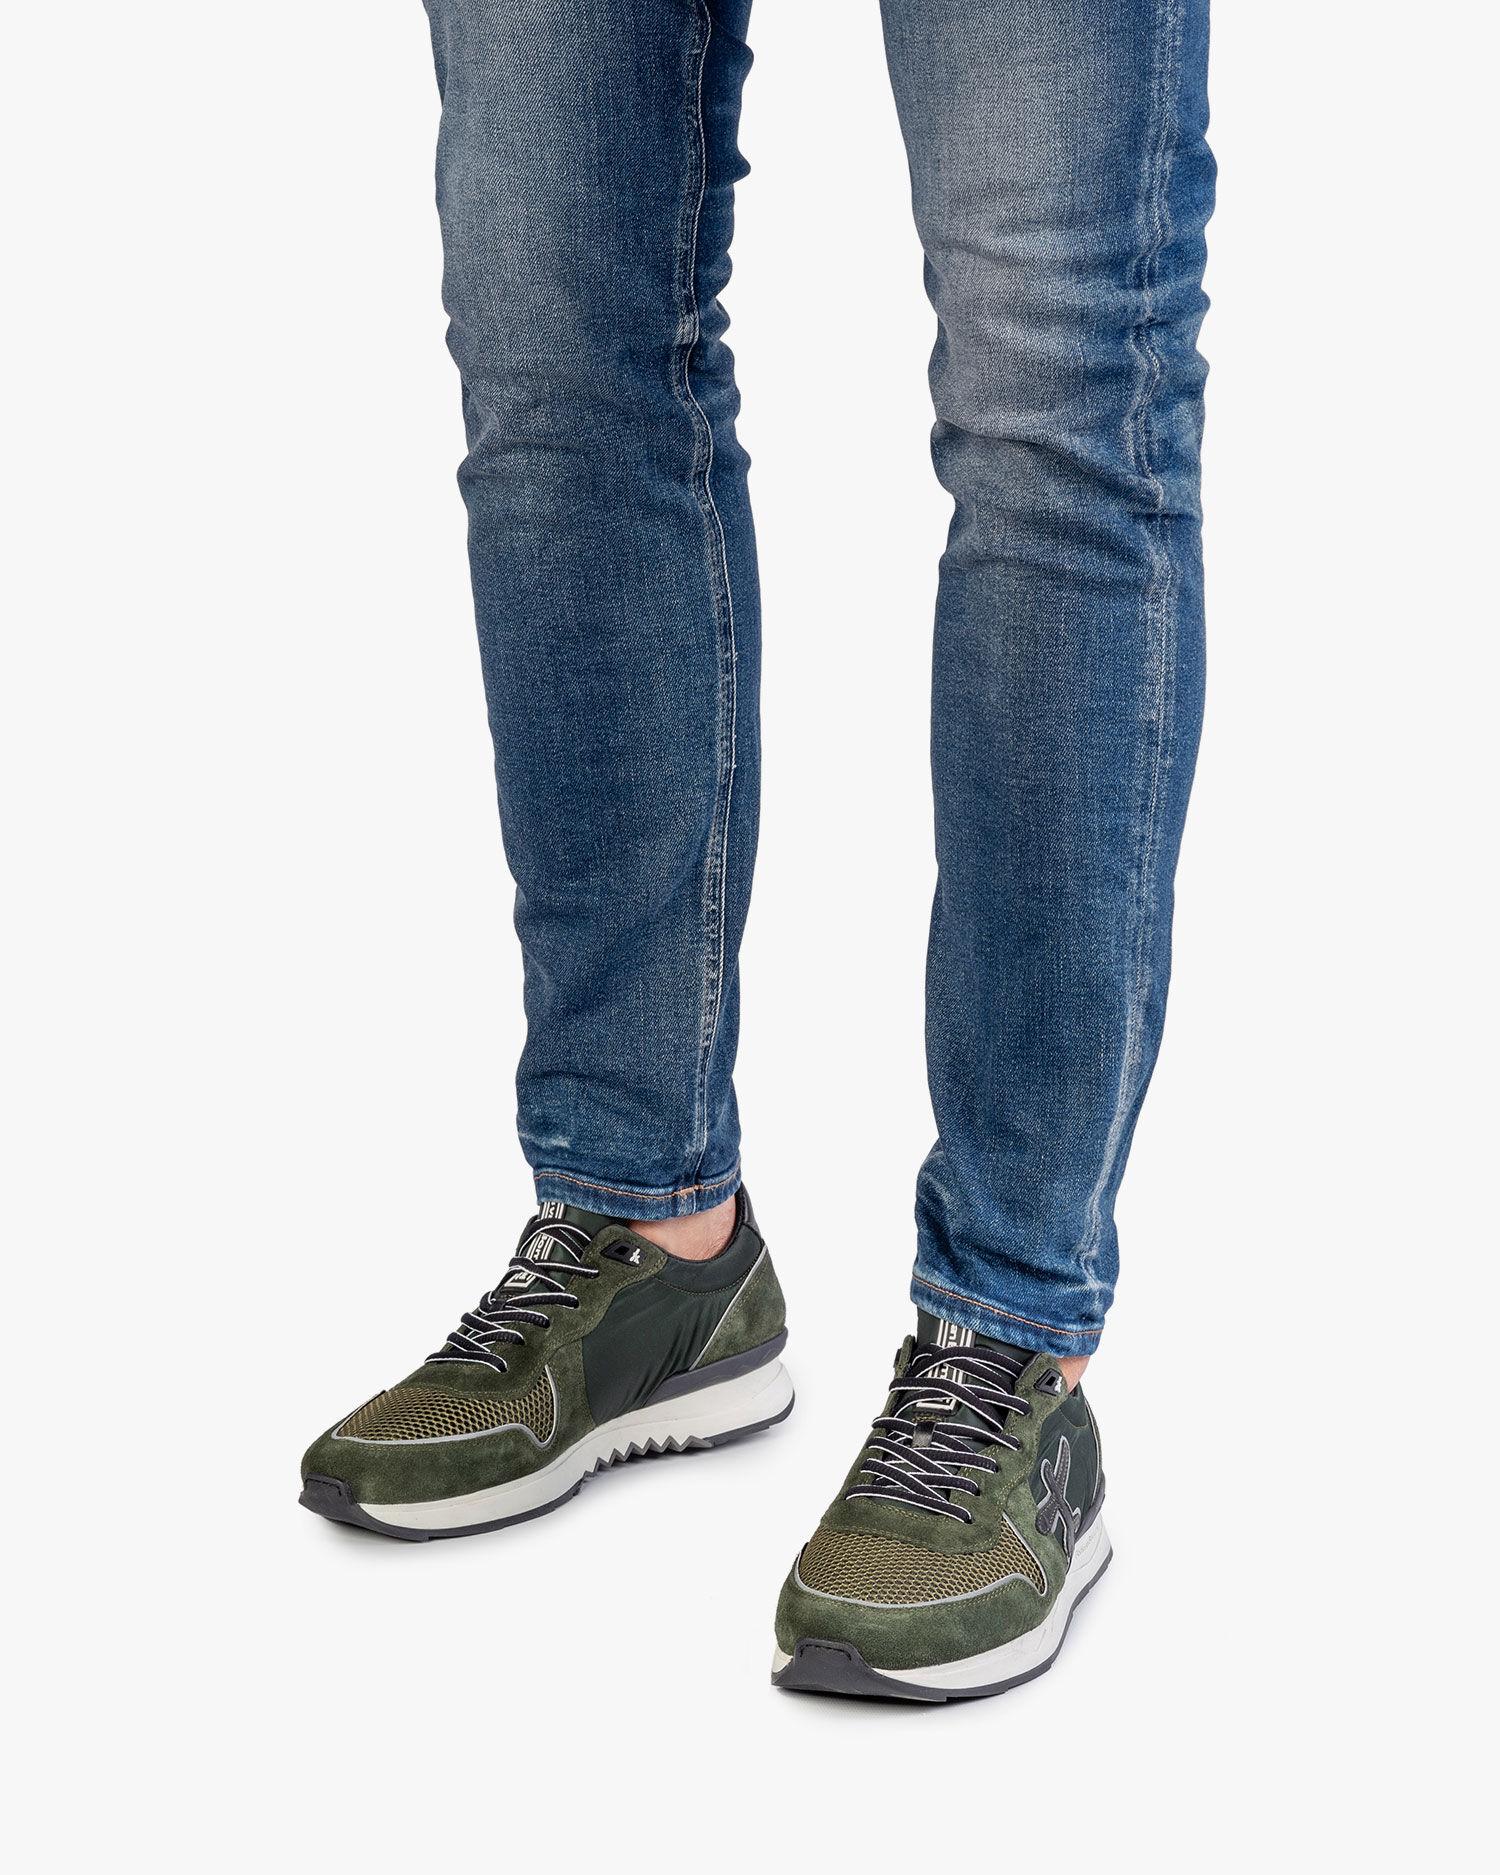 Green suede leather sneaker 16284/03 | Floris van Bommel Official®